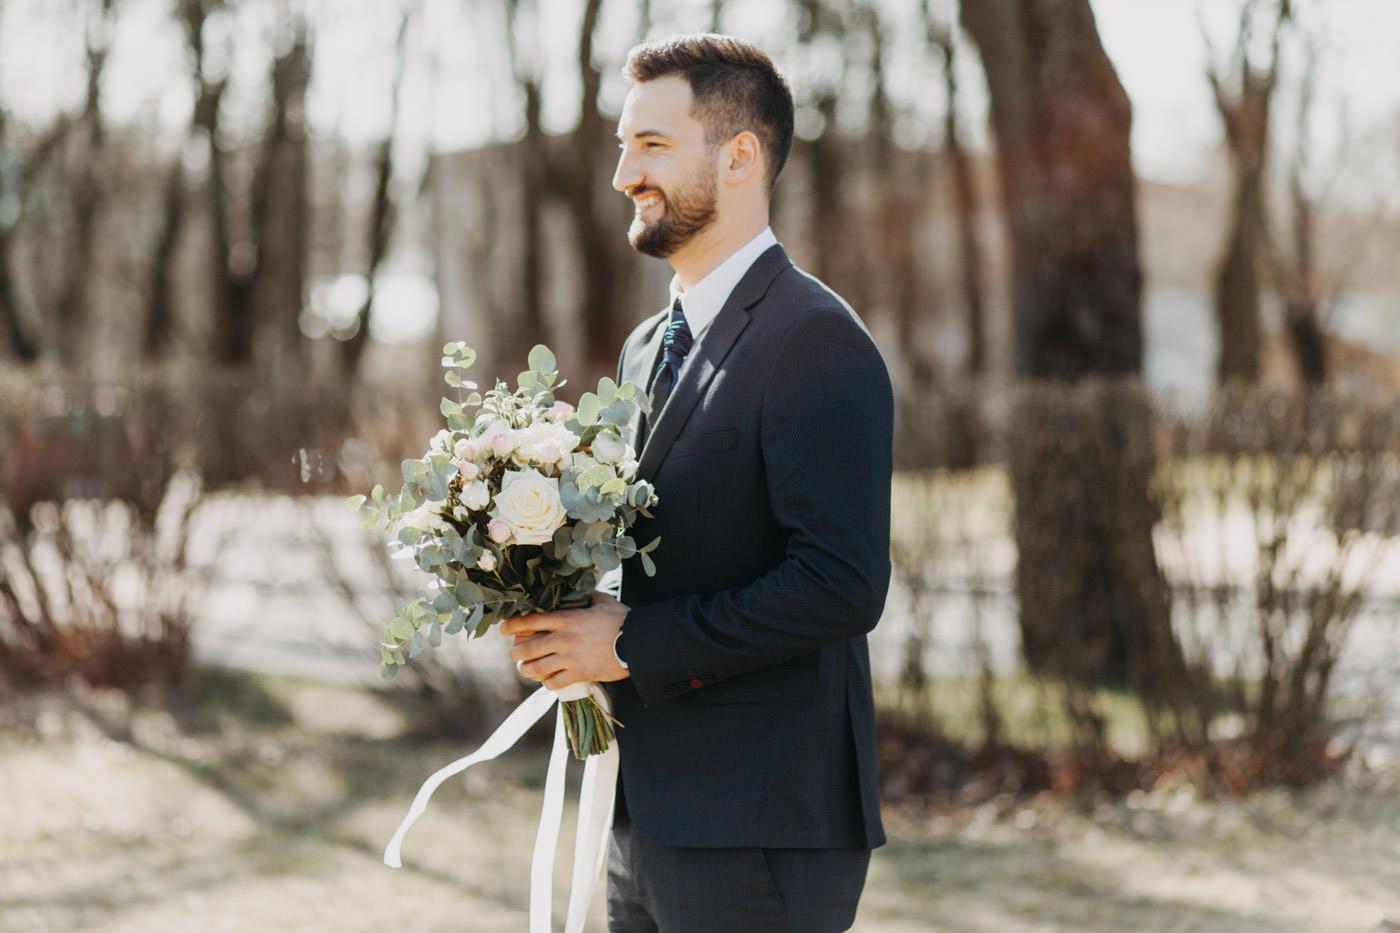 Pavasara kāzu uzvalks